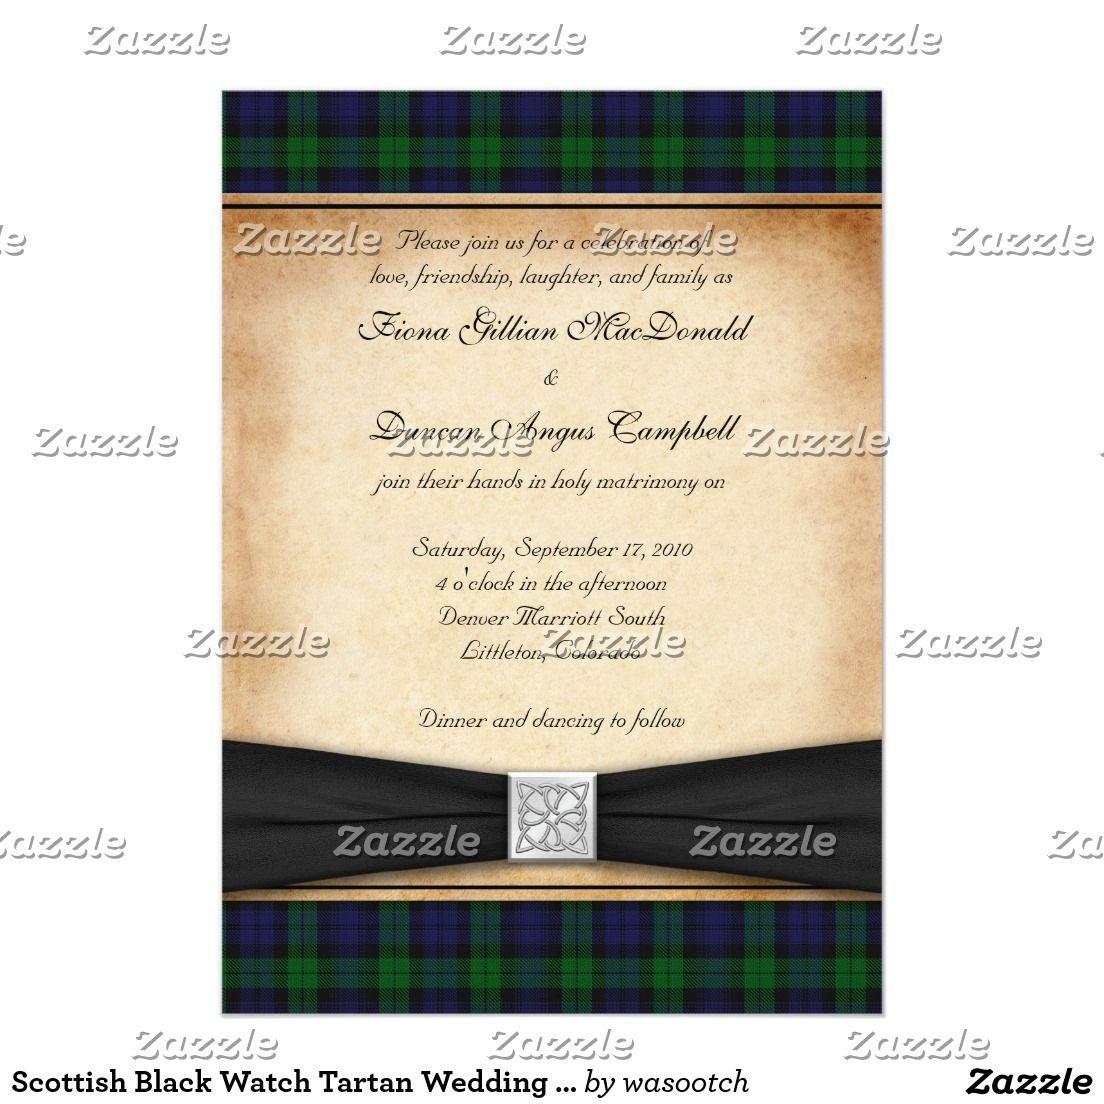 Scottish Black Watch Tartan Wedding Invitation